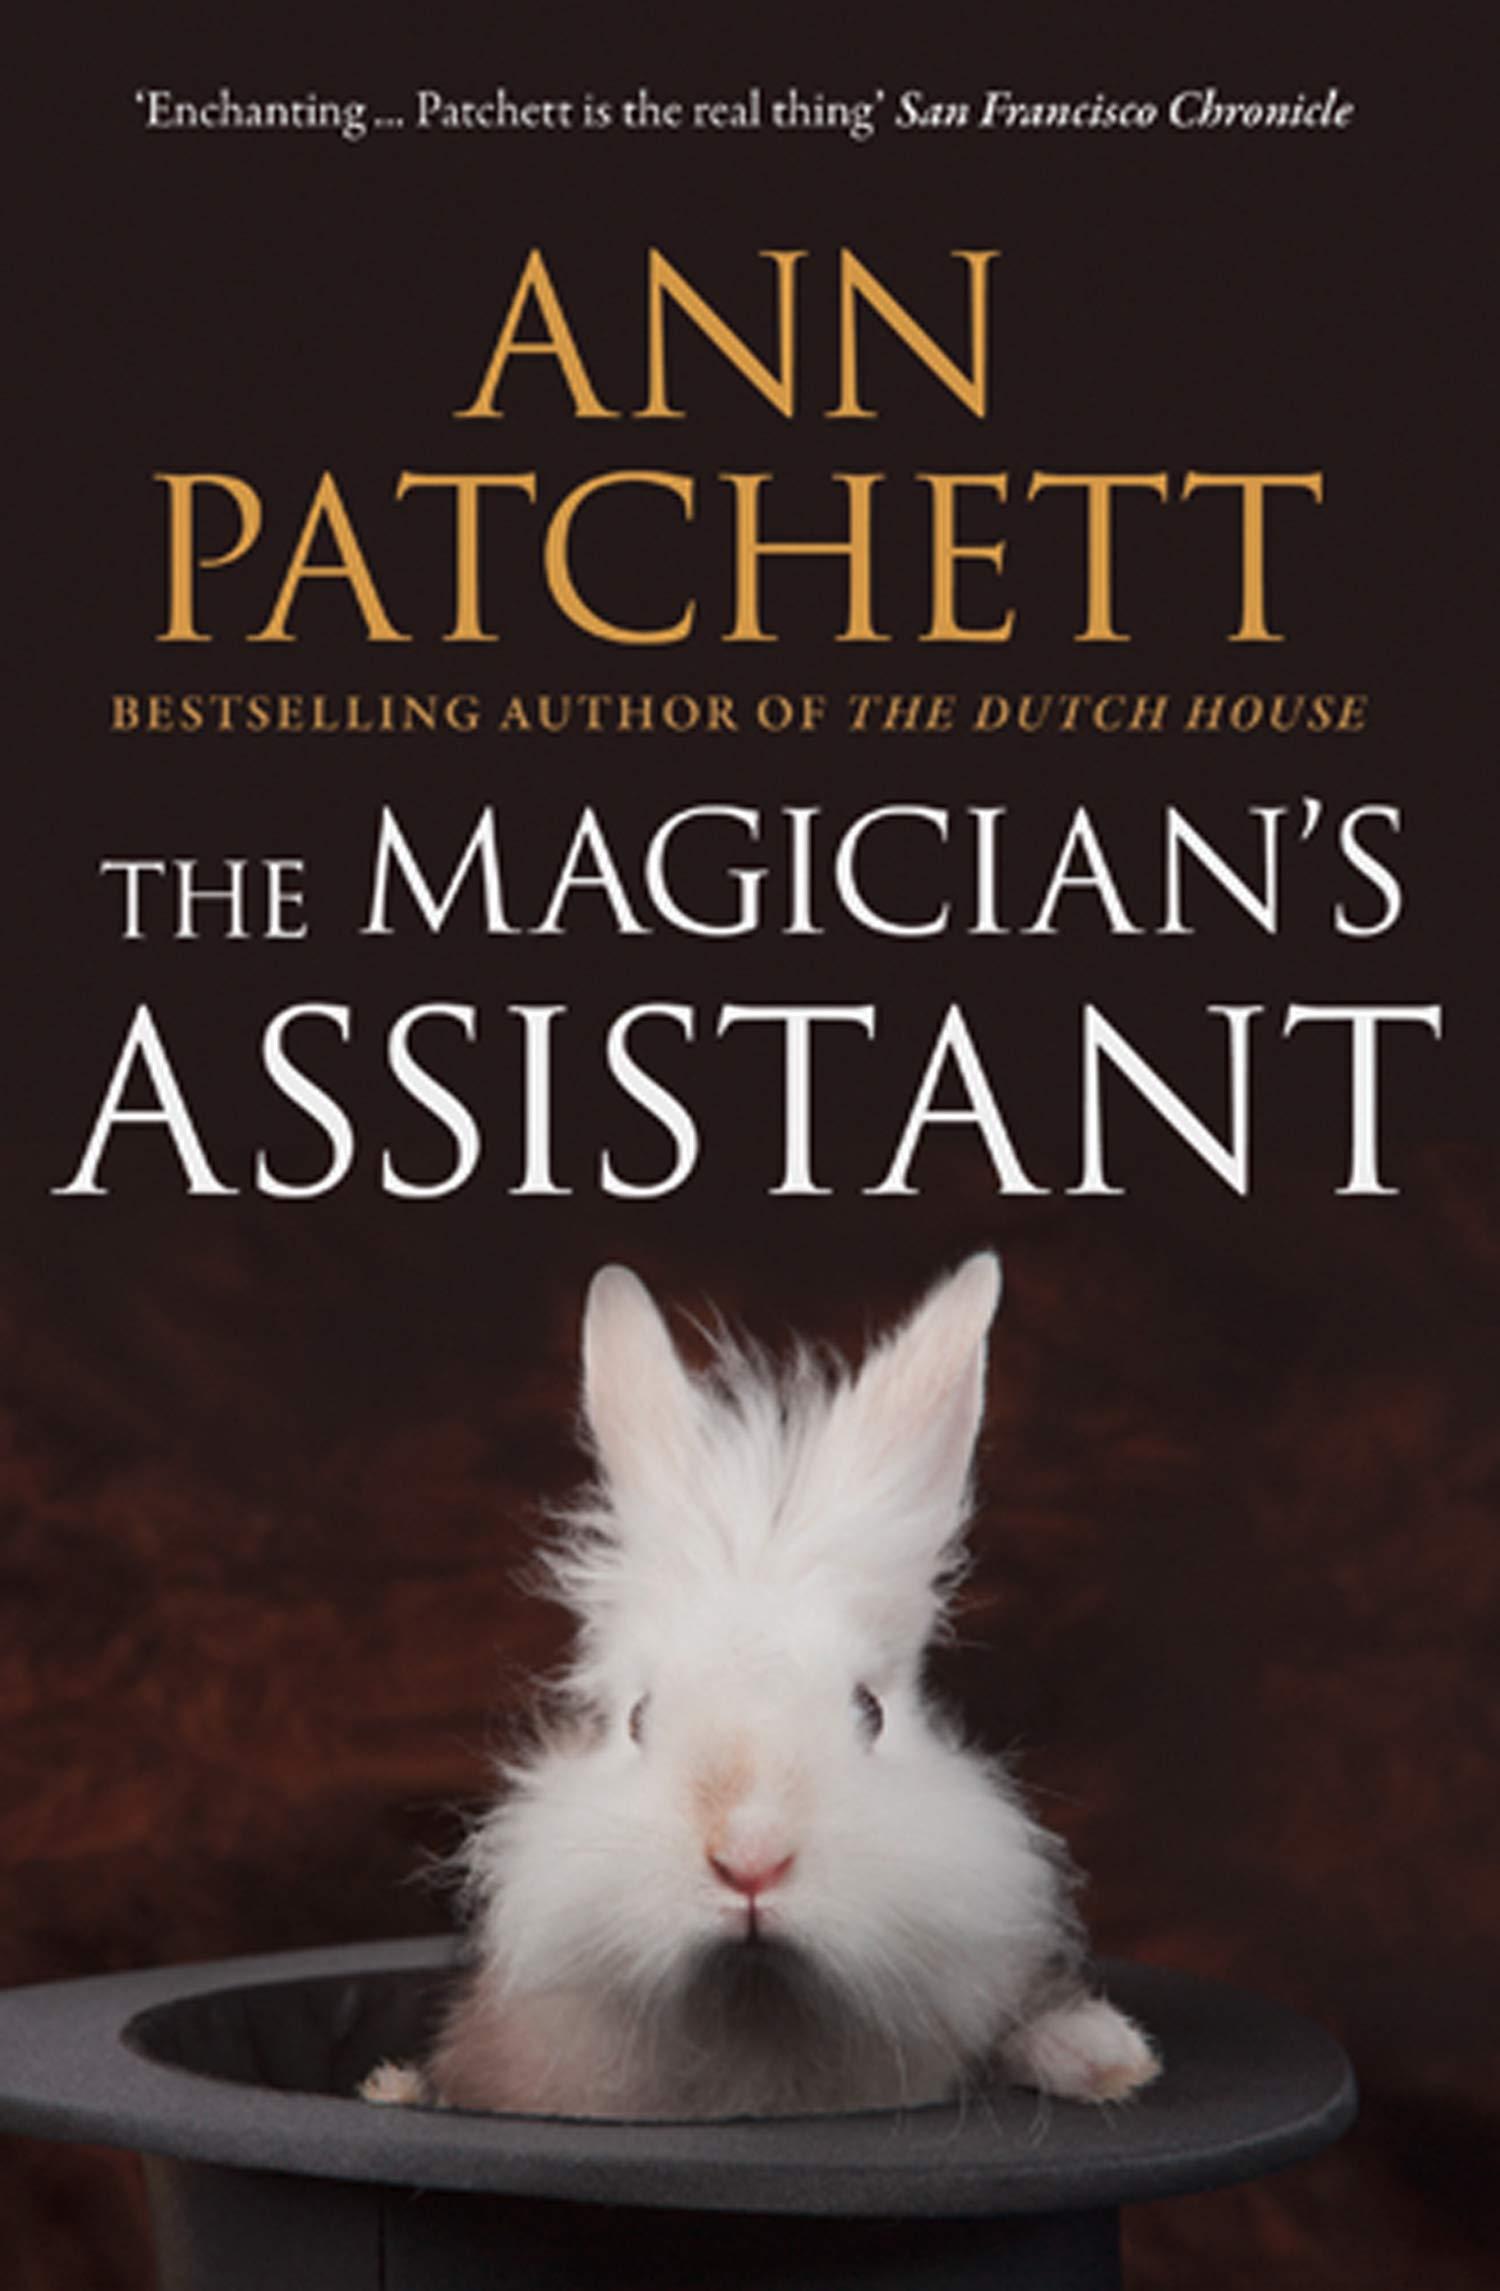 The Magician's Assistant  Patchett, Ann Amazon.de Bücher